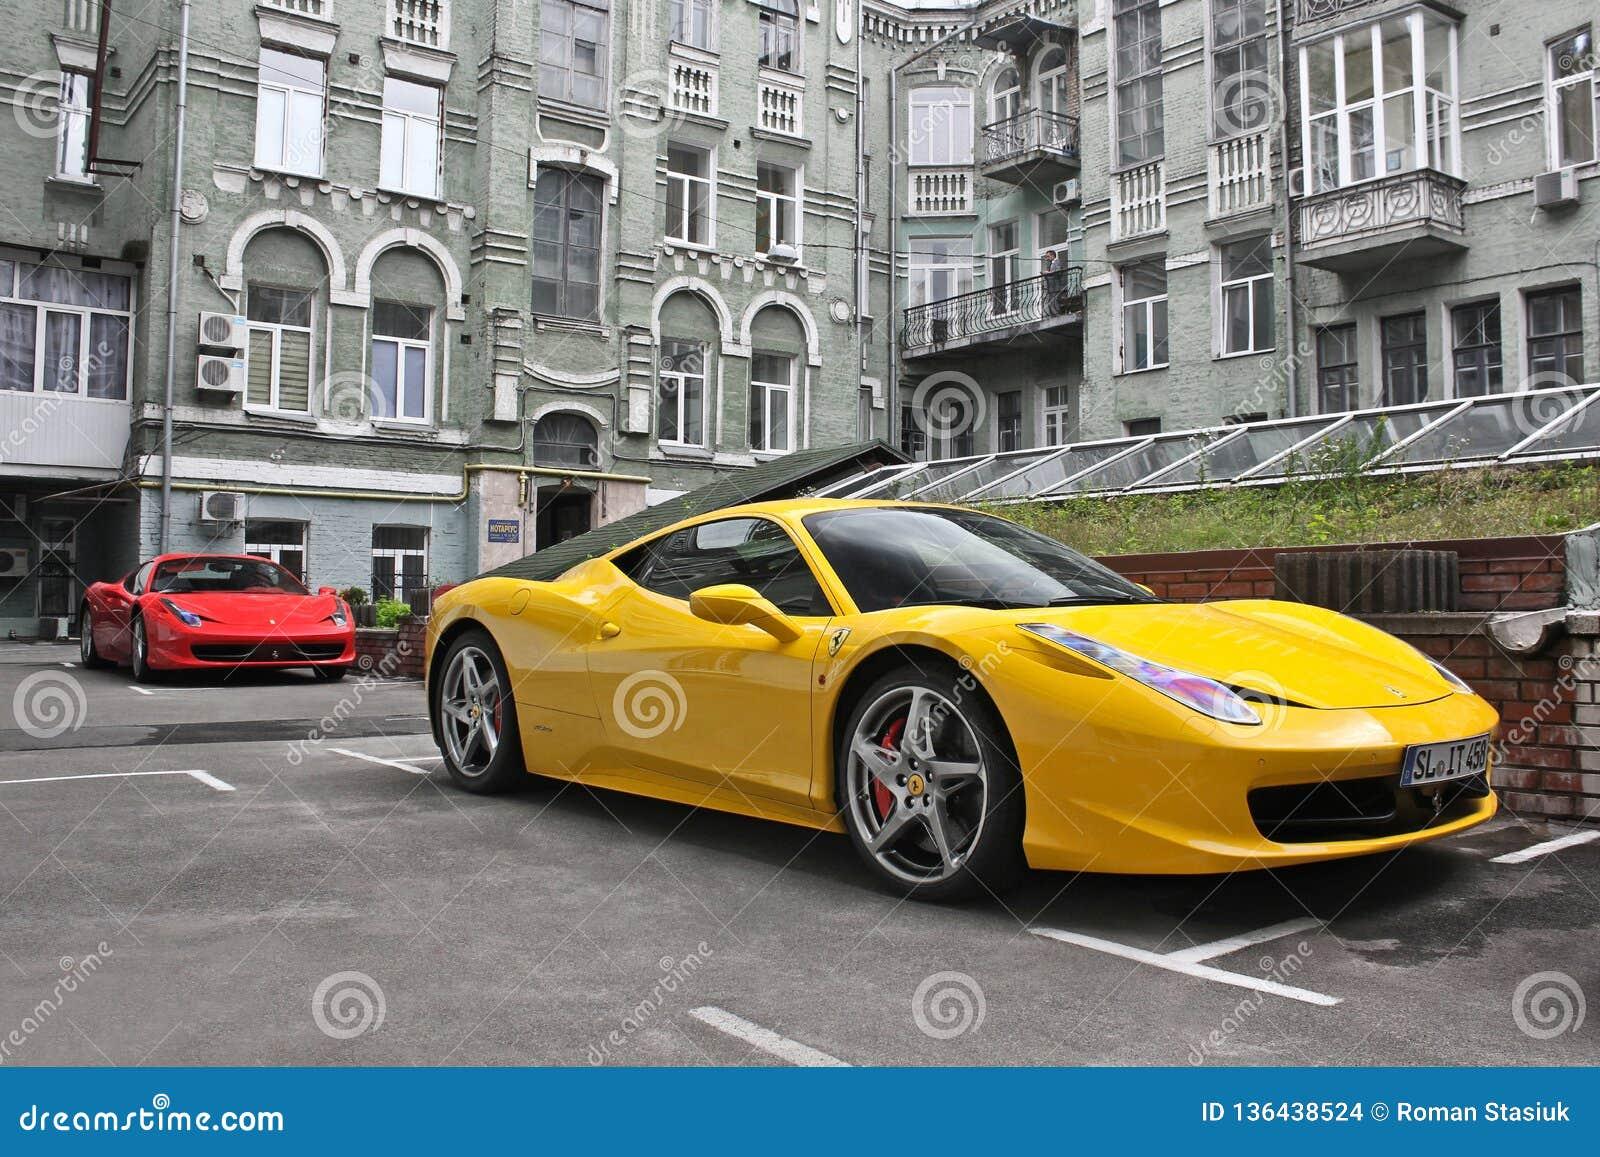 February 27 Ukraine Kiev Ferrari 458 Italia And Ferrari 458 Spider Yellow And Red Editorial Stock Image Image Of Gear Driver 136438524